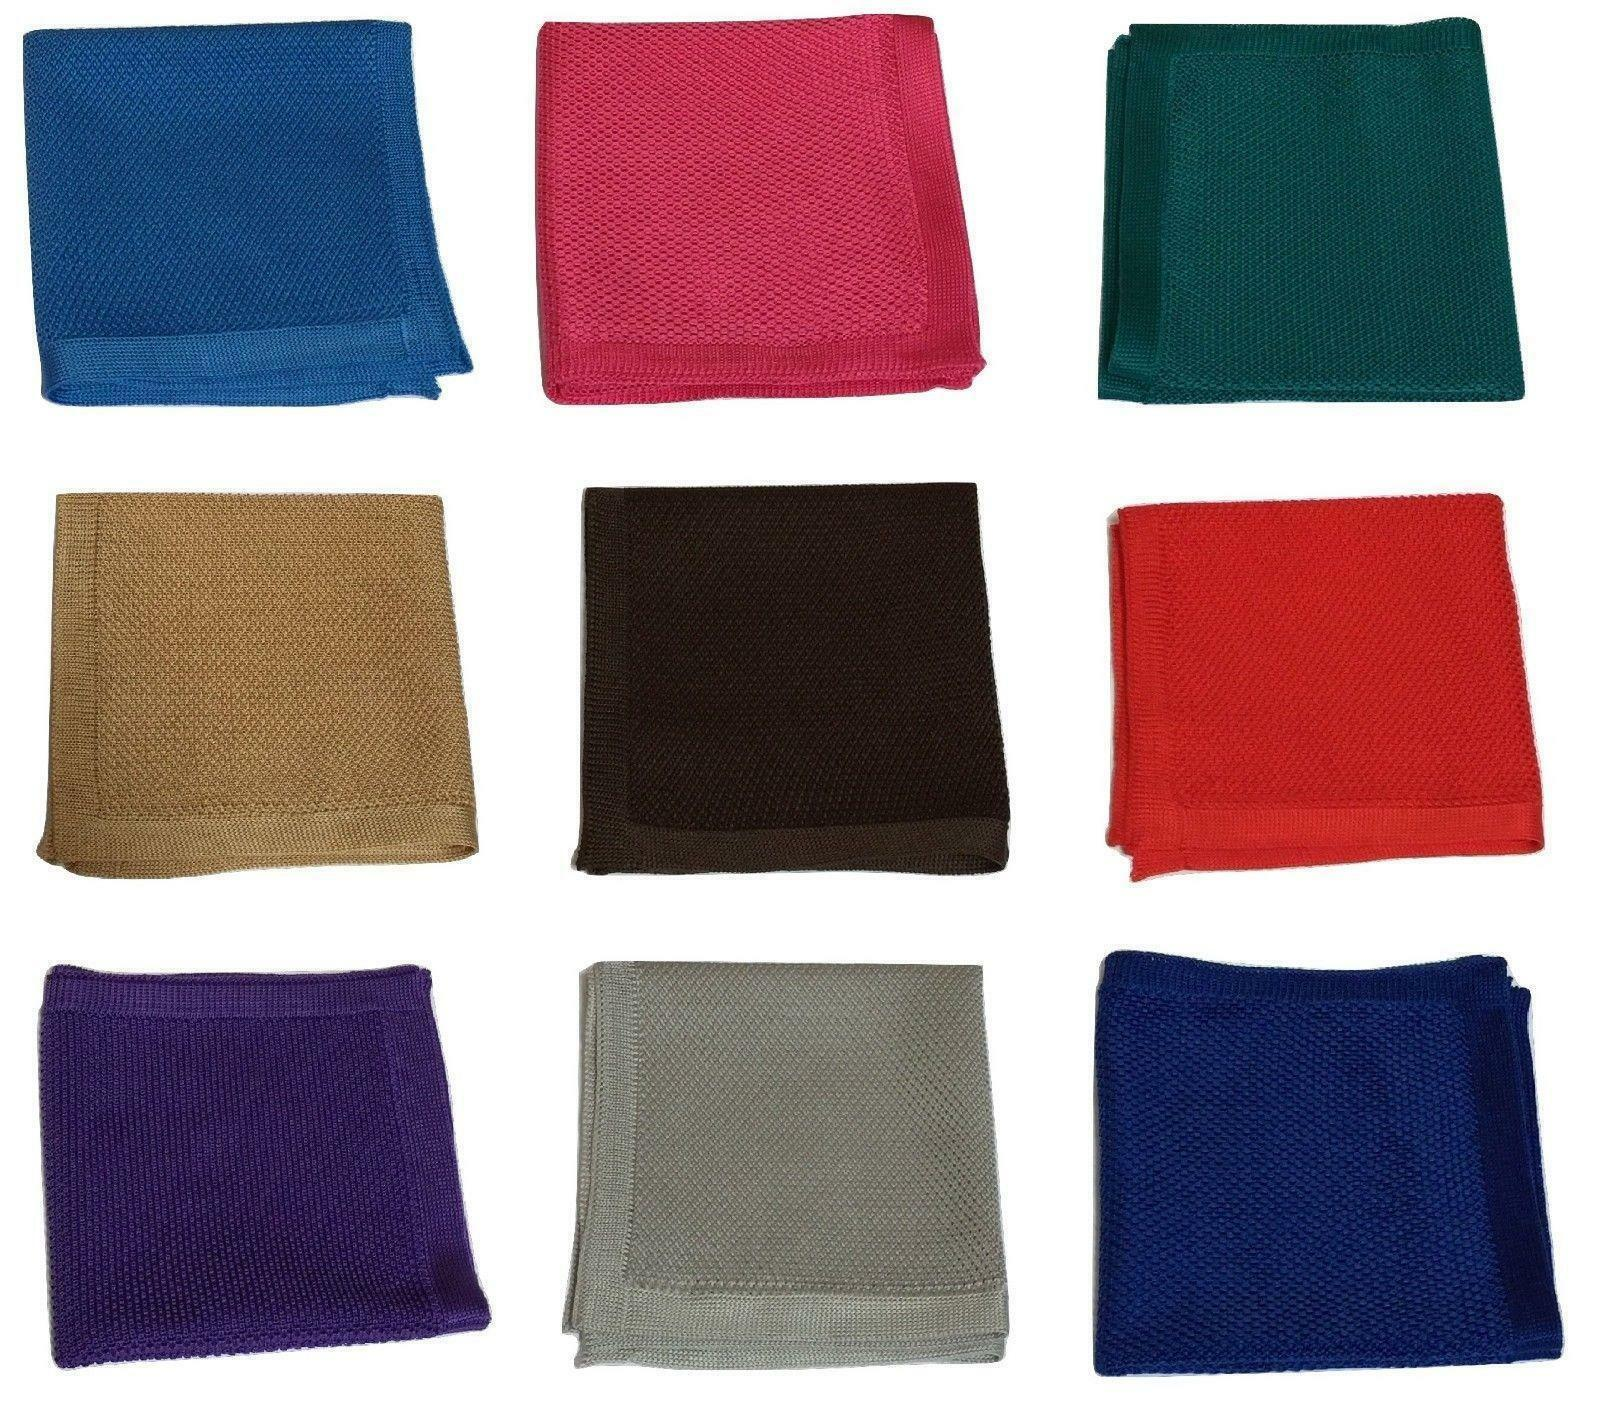 Premium Hand Made Mens Square Crocheted Wedding Event Pocket Handkerchief